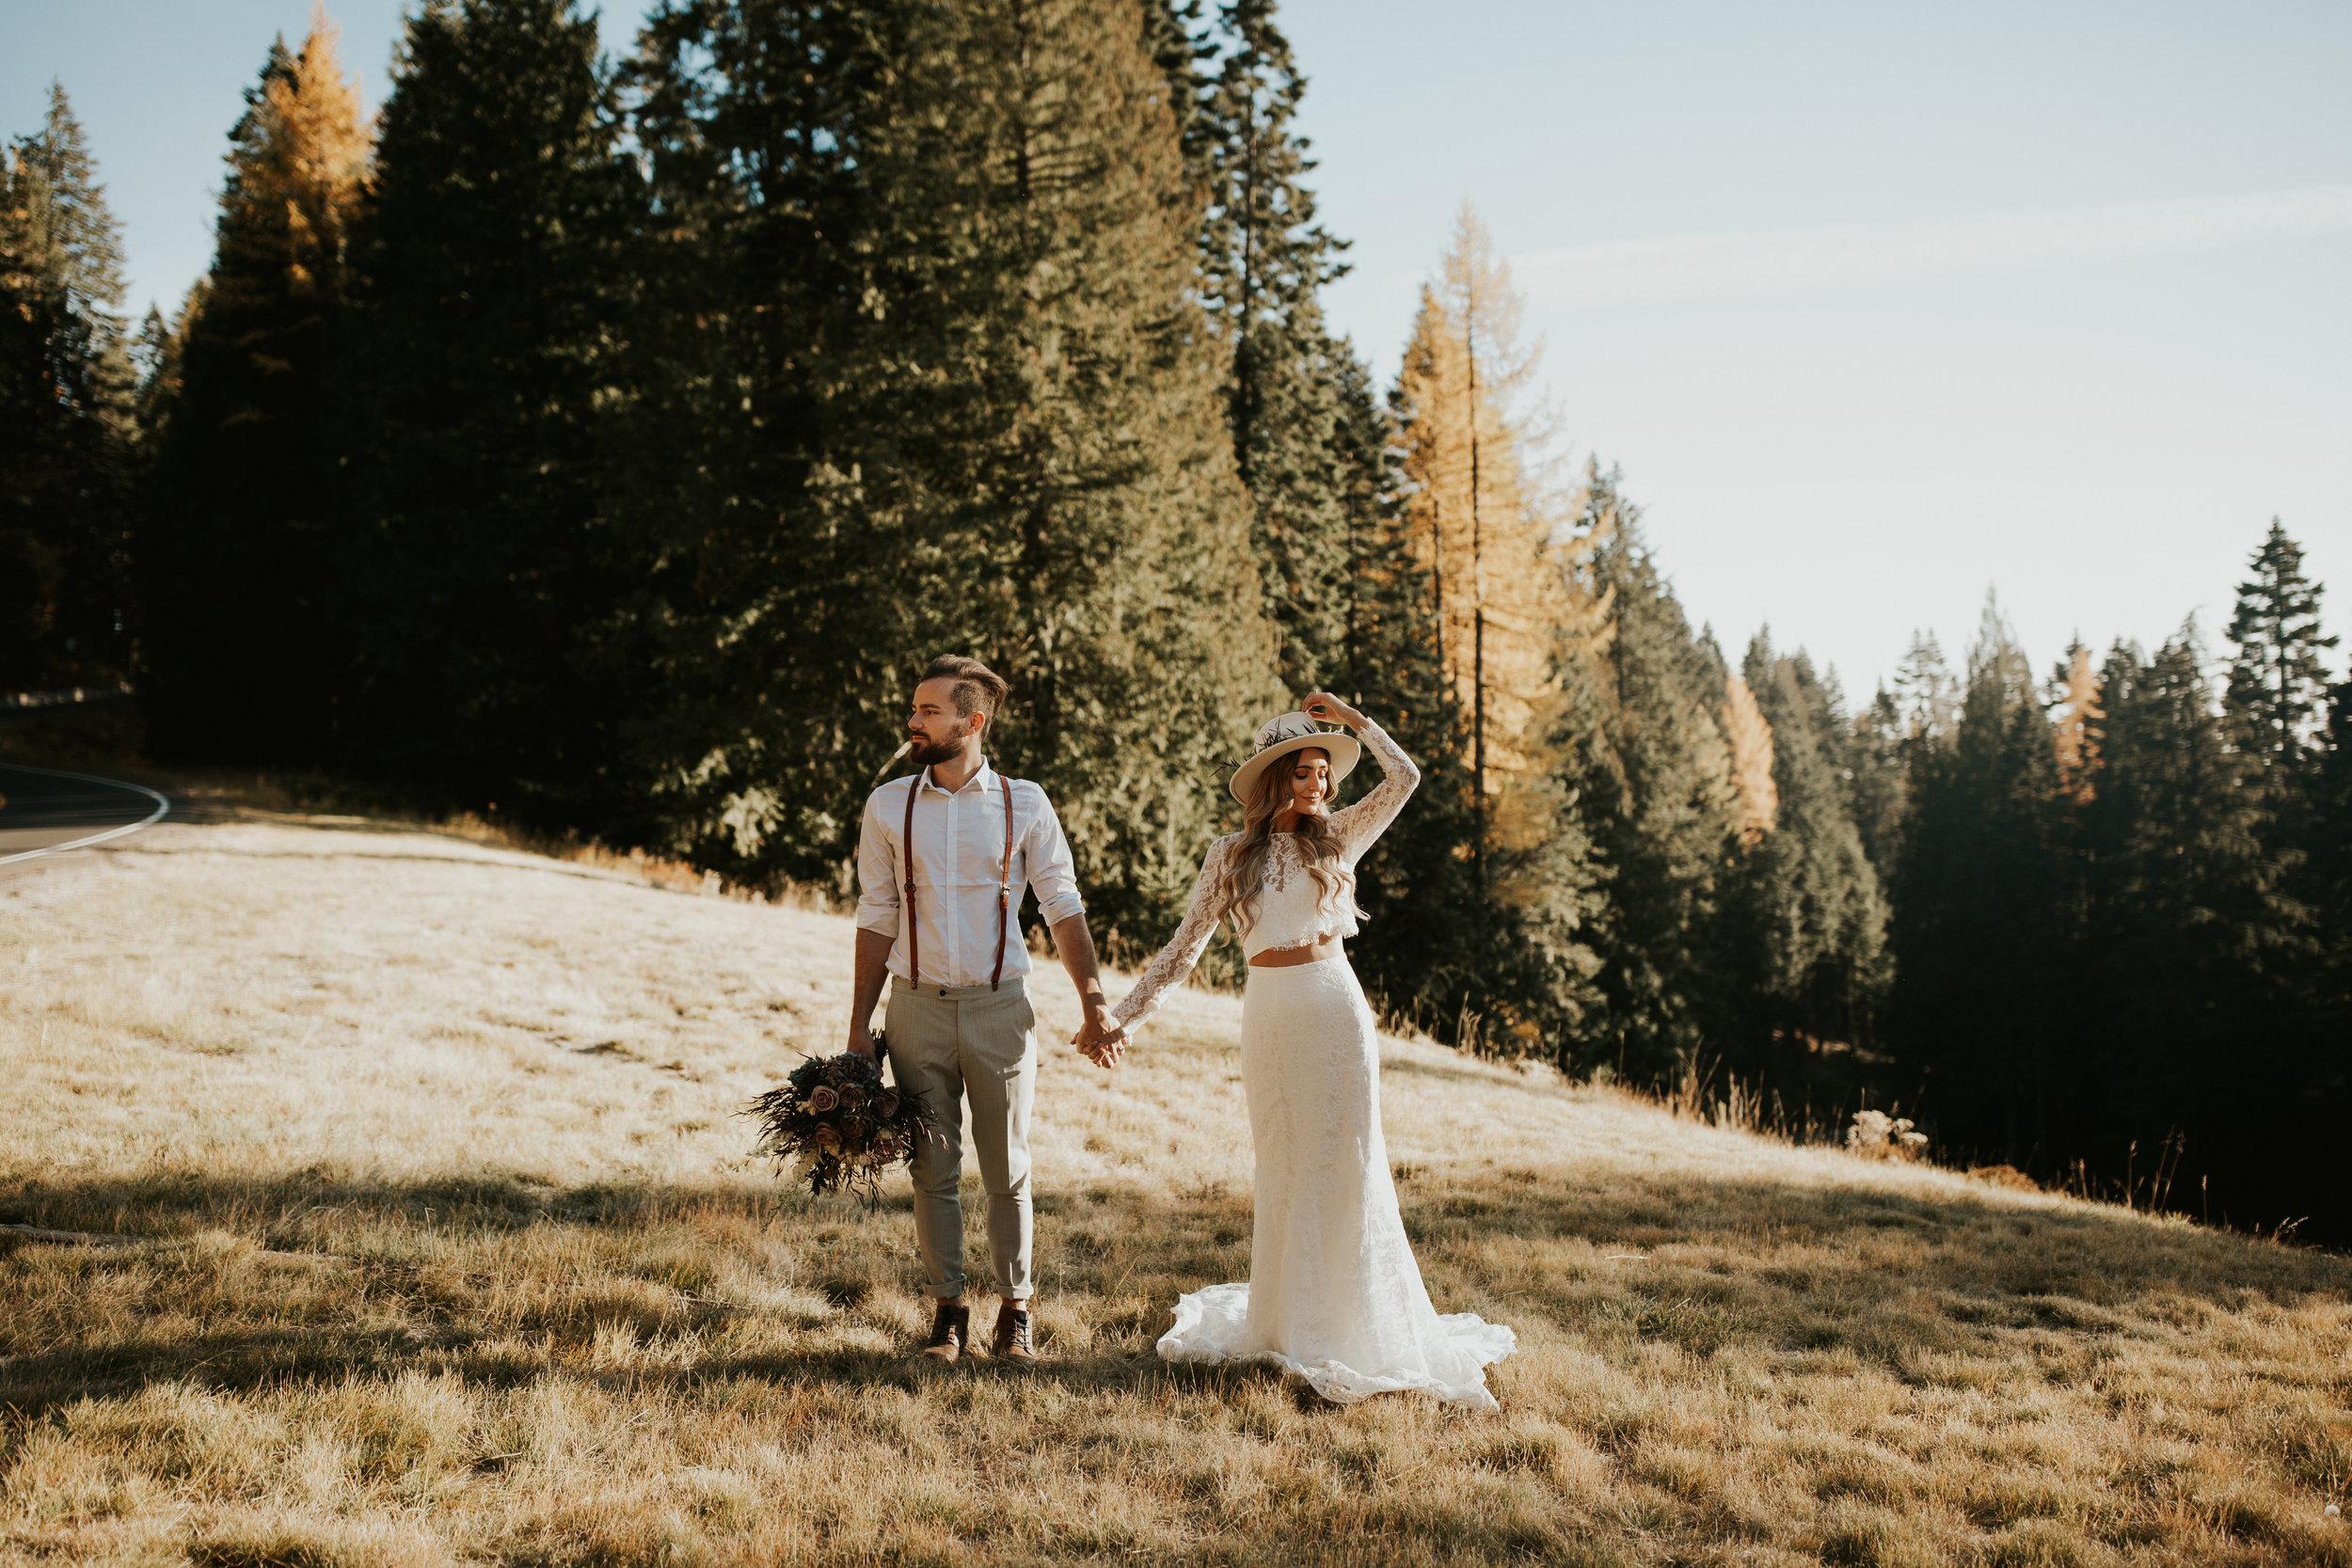 mt Spokane bridal photo shoot on a hill